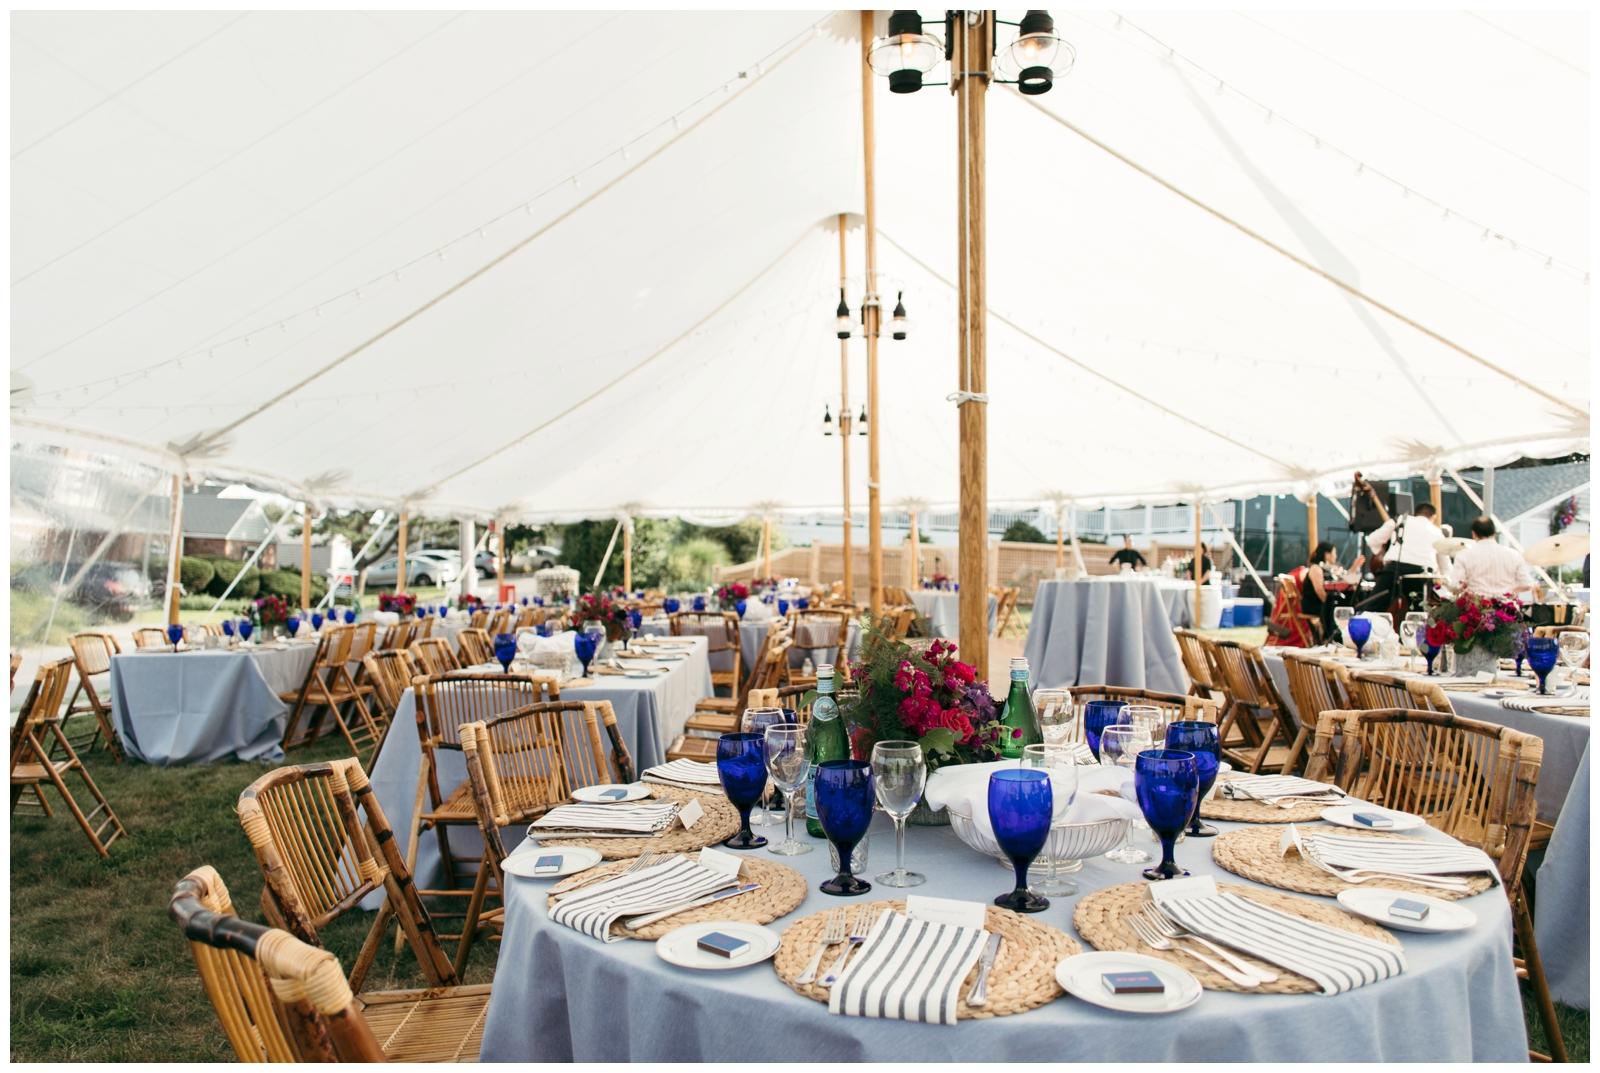 Bailey-Q-Photo-Backyard-Wedding-South-Shore-Boston-Wedding-Photographer-087.jpg